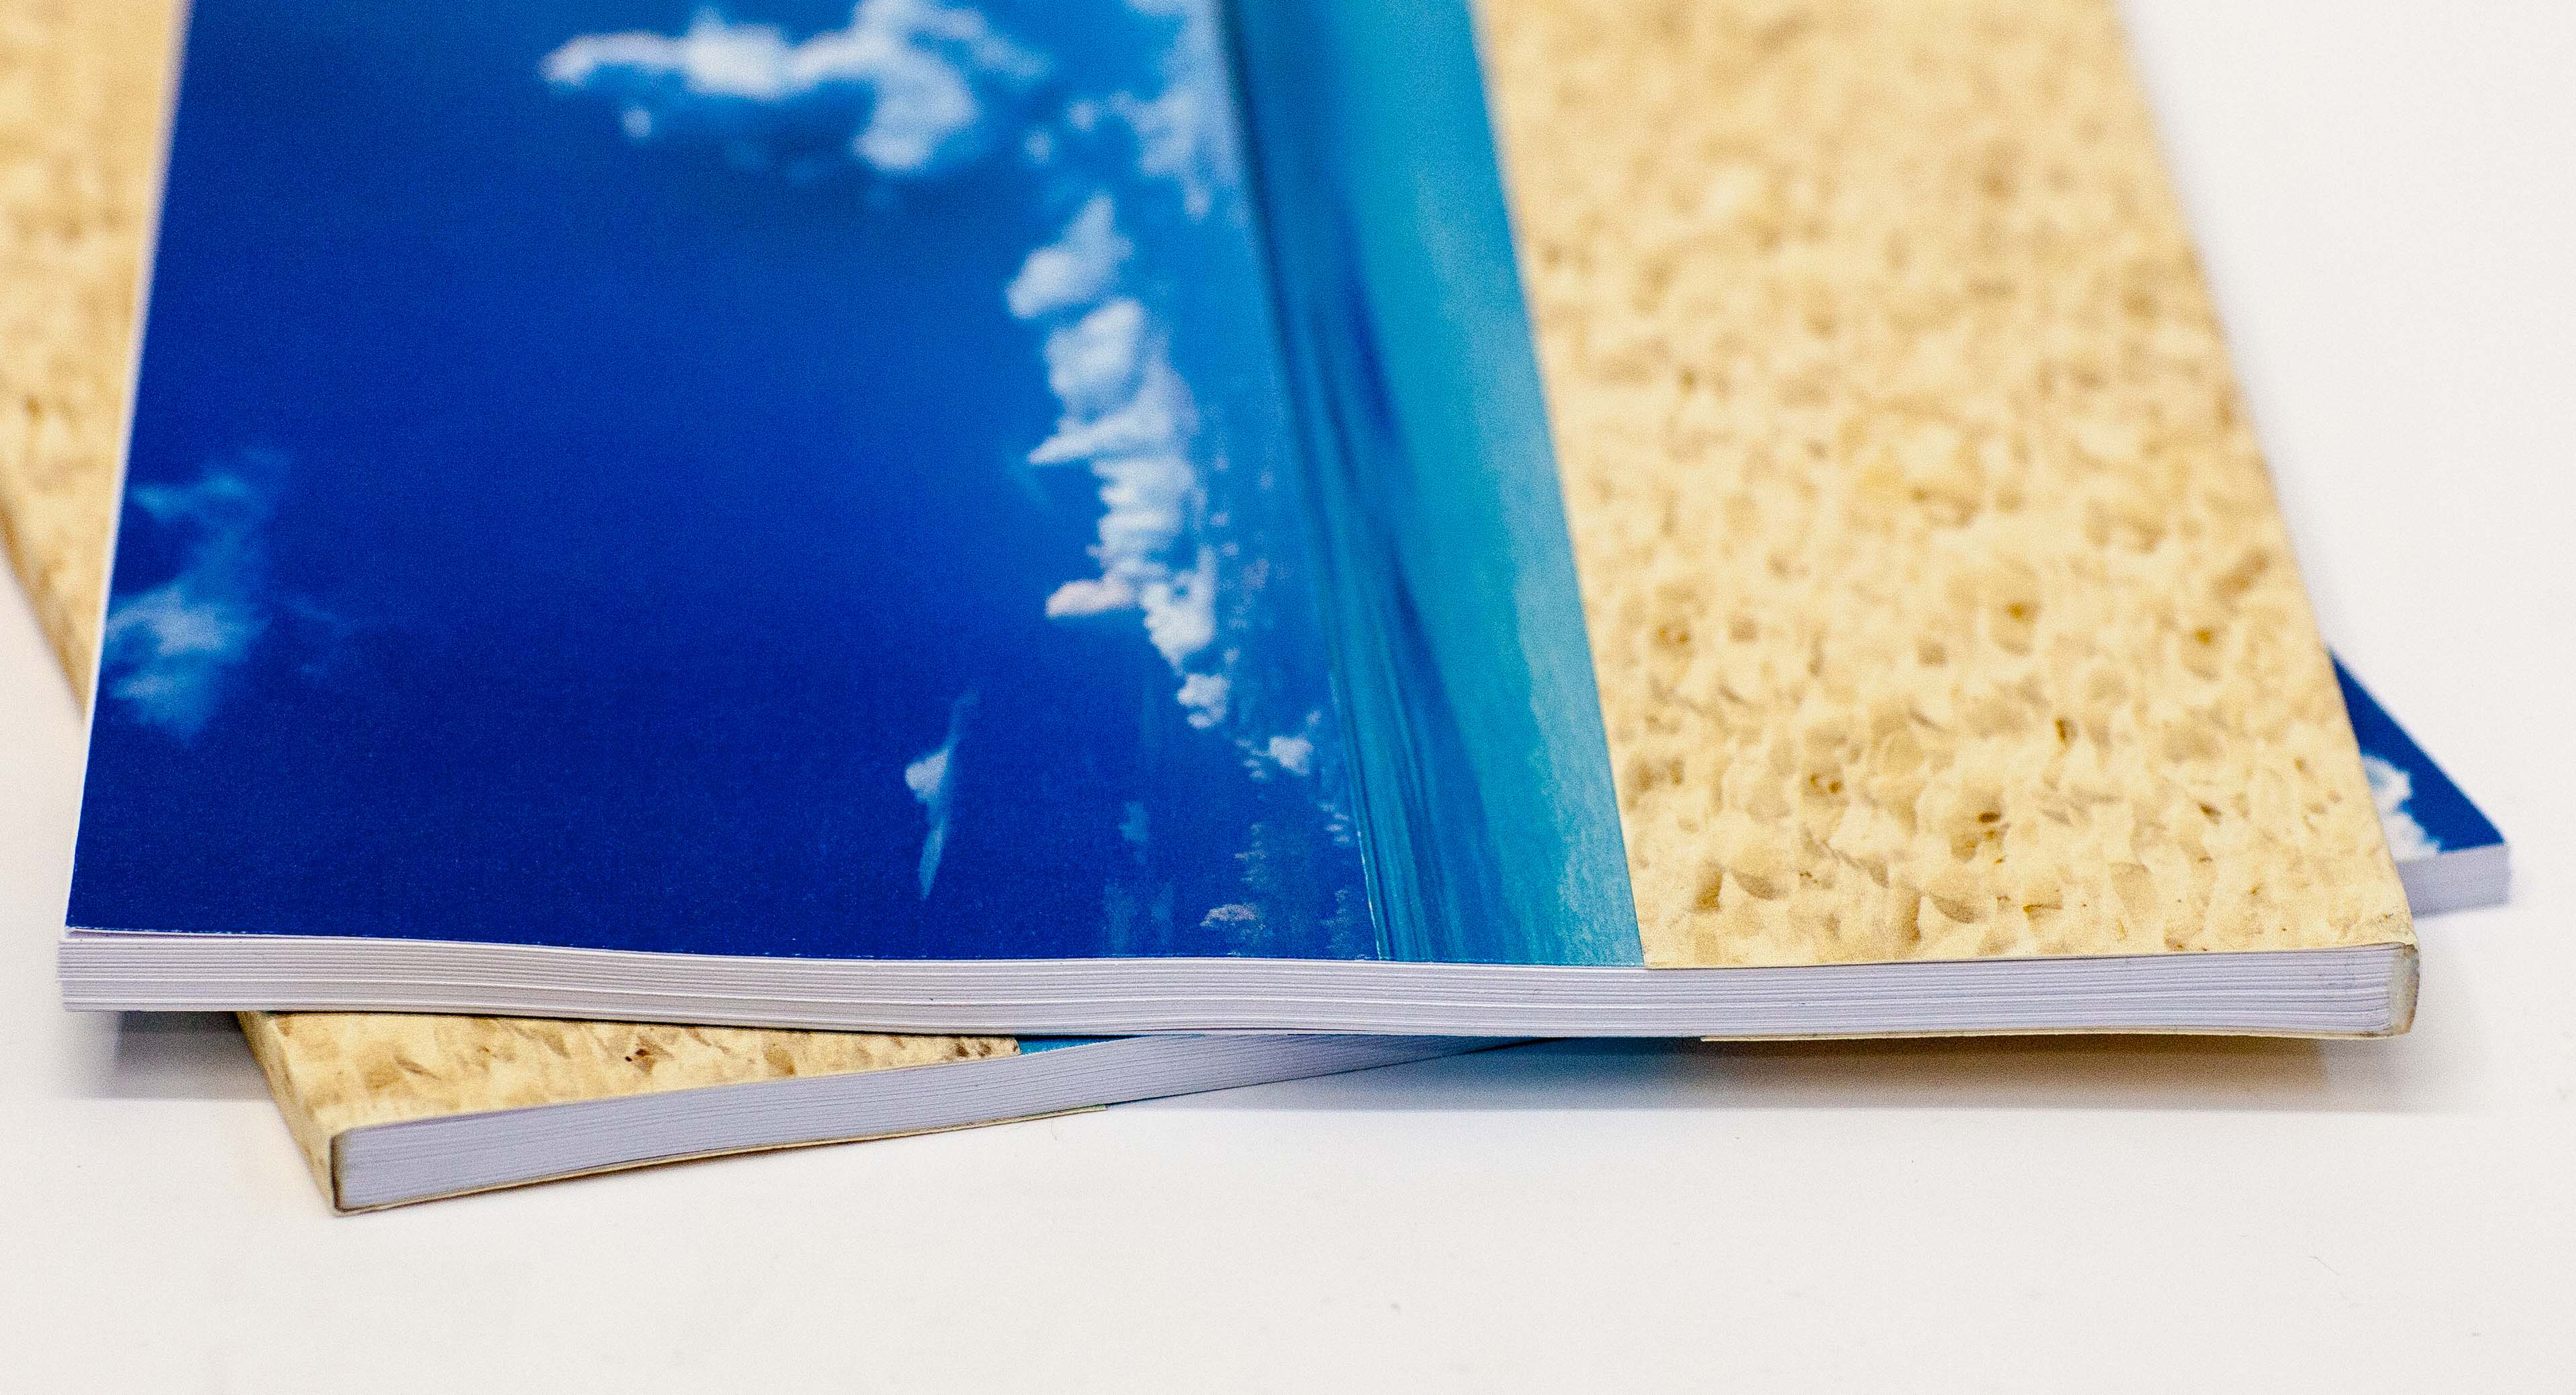 Custom printed tape bound book